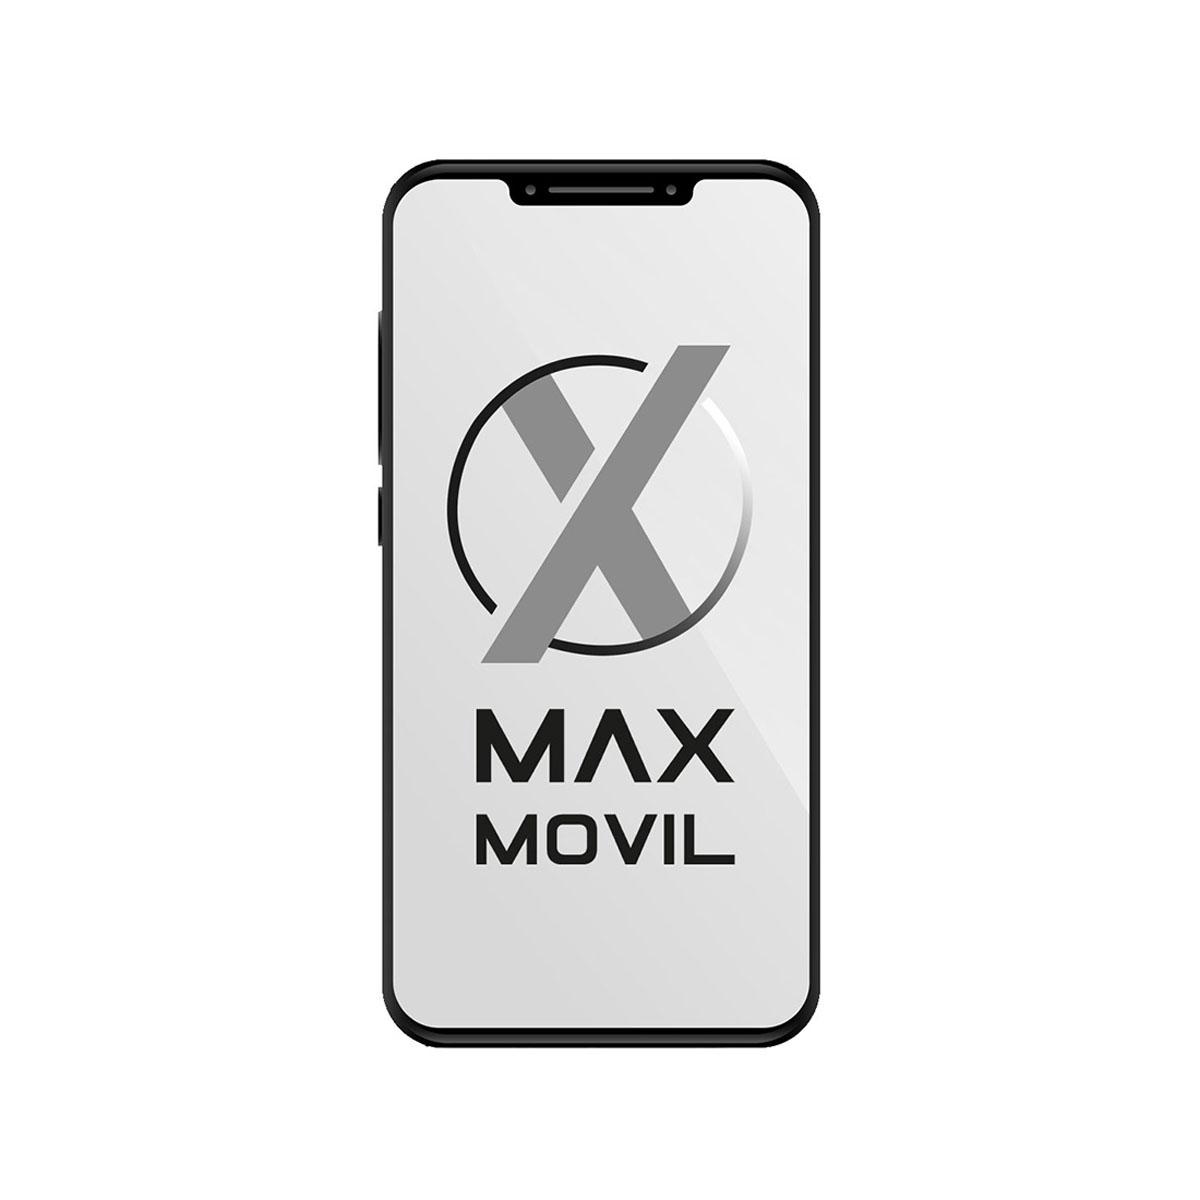 Comprar funda lifeproof n d negra para iphone 6 plus maxmovil - Fundas lifeproof ...